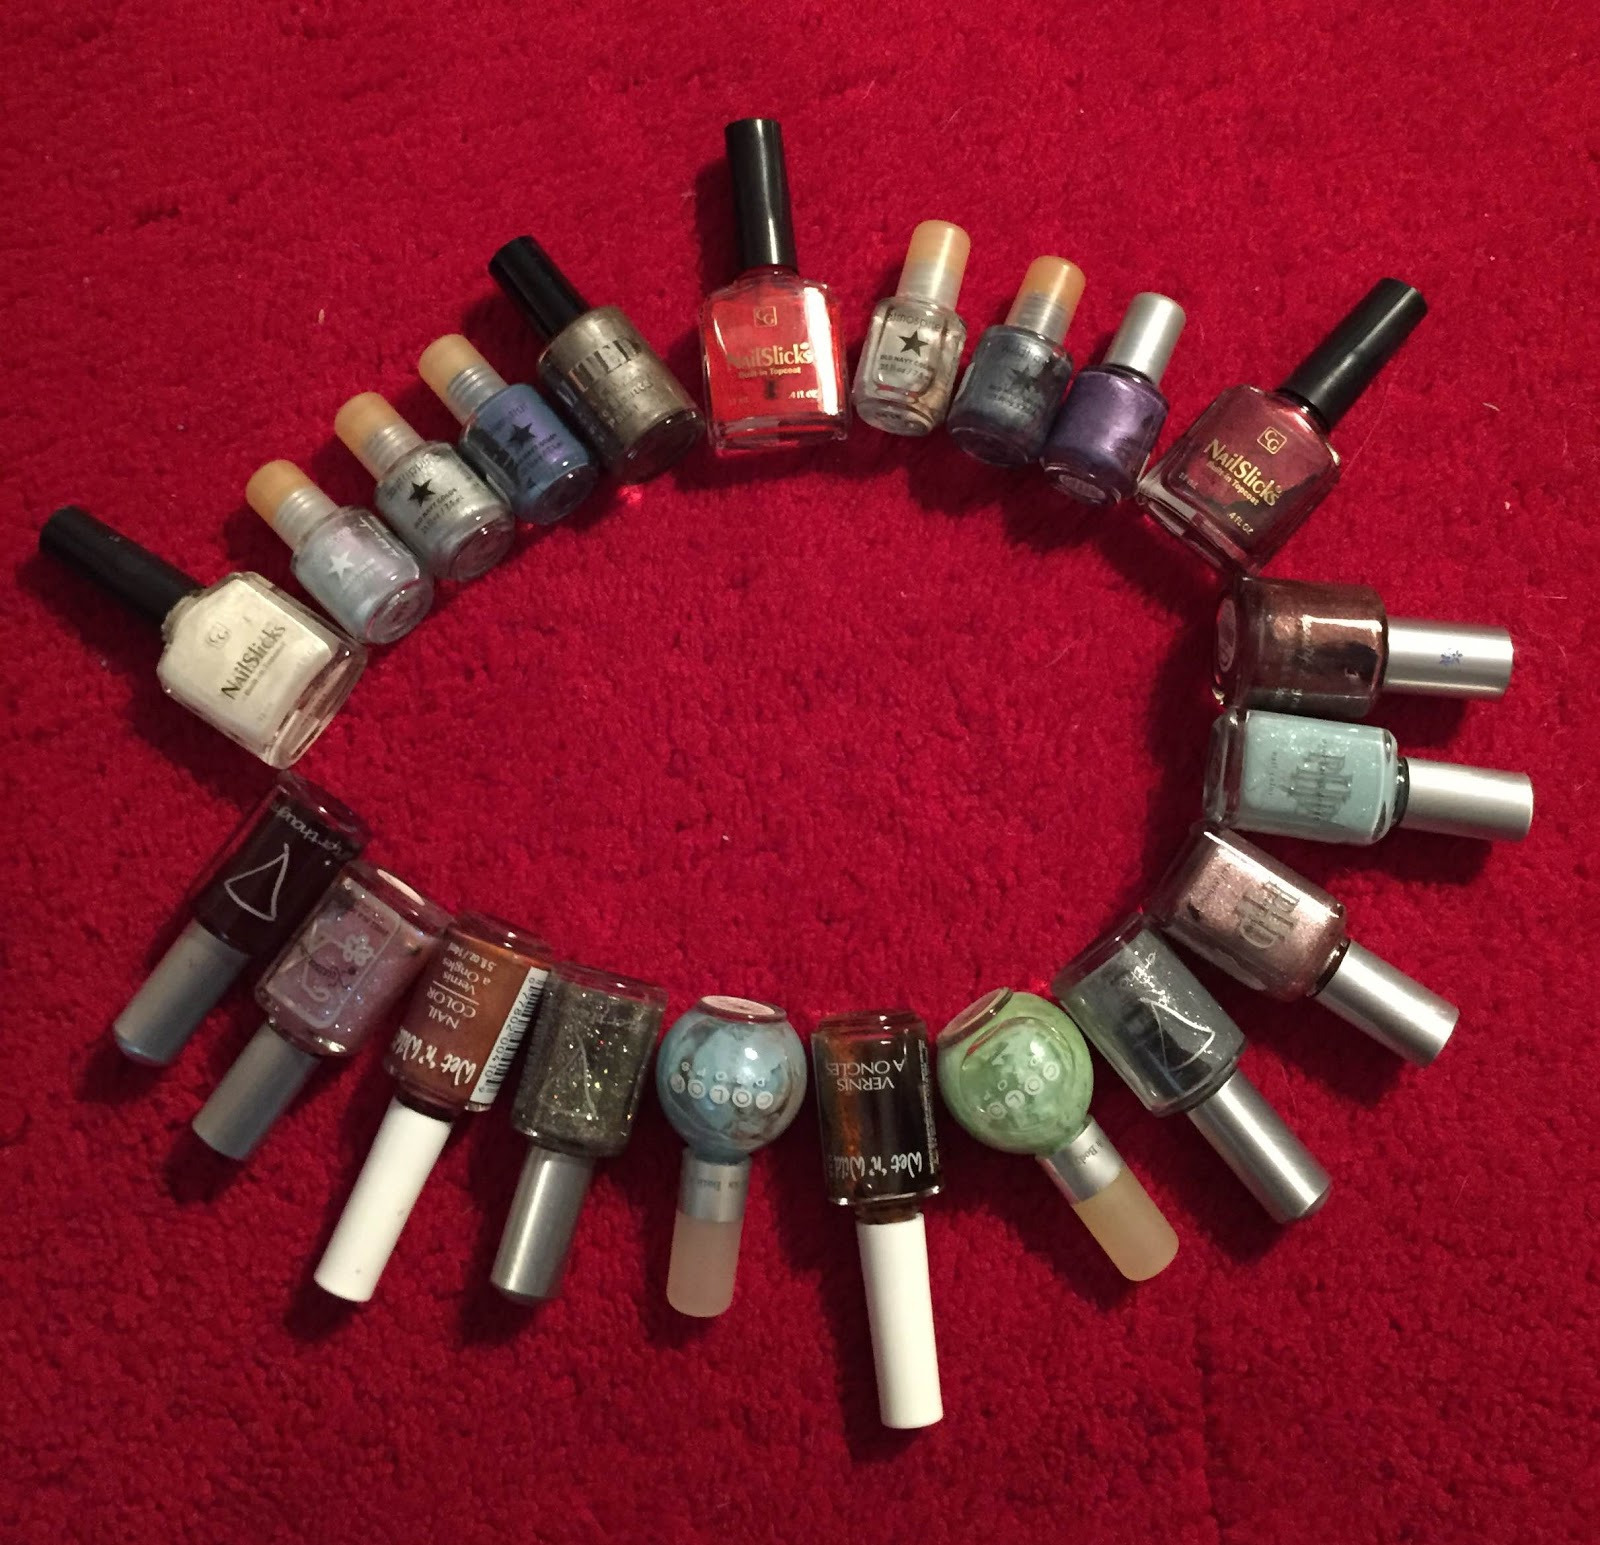 The Beauty of Life: Throwback Thursday: How My Nail Polish ...